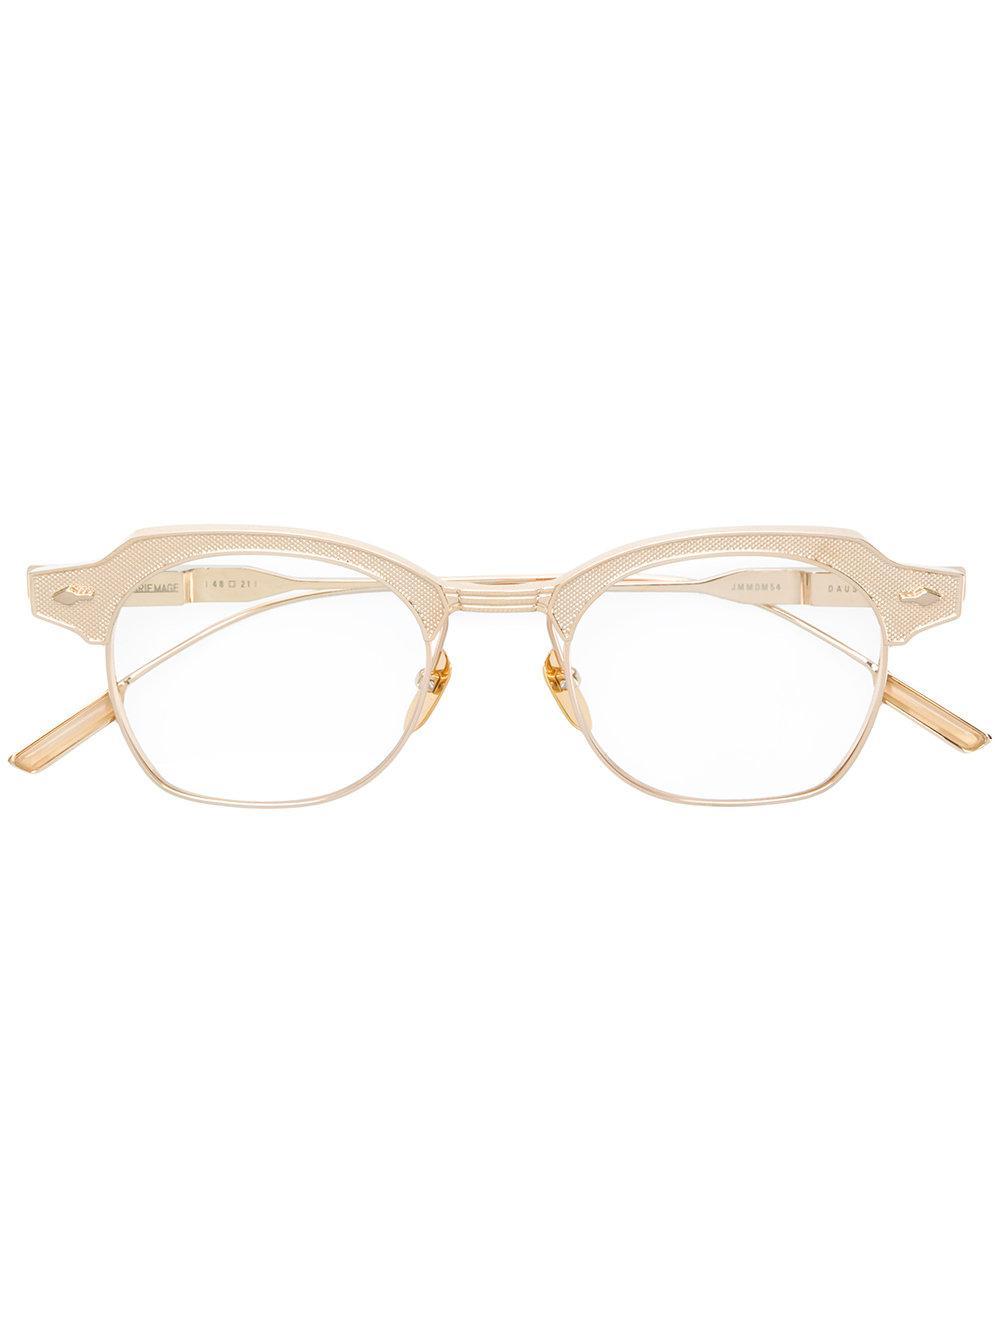 Jacques Marie Mage Dausmenil Round Frame Glasses In Metallic